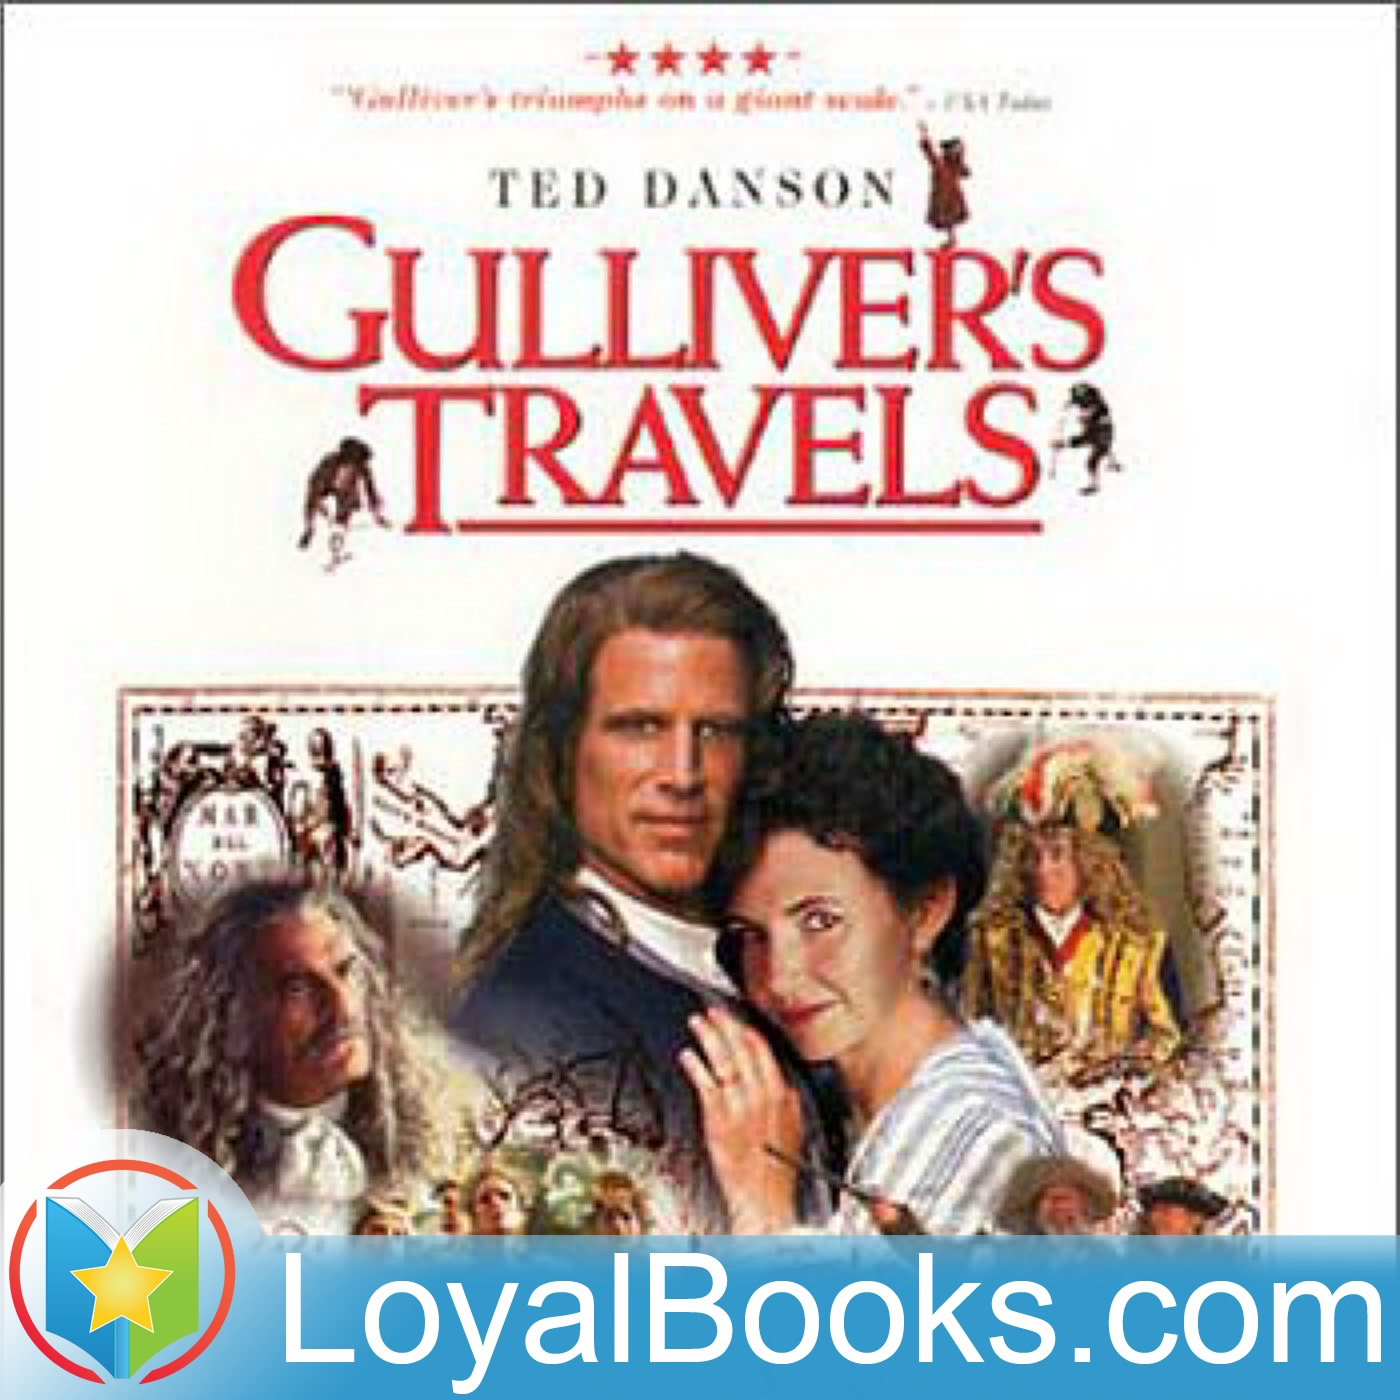 <![CDATA[Gulliver's Travels by Jonathan Swift]]>